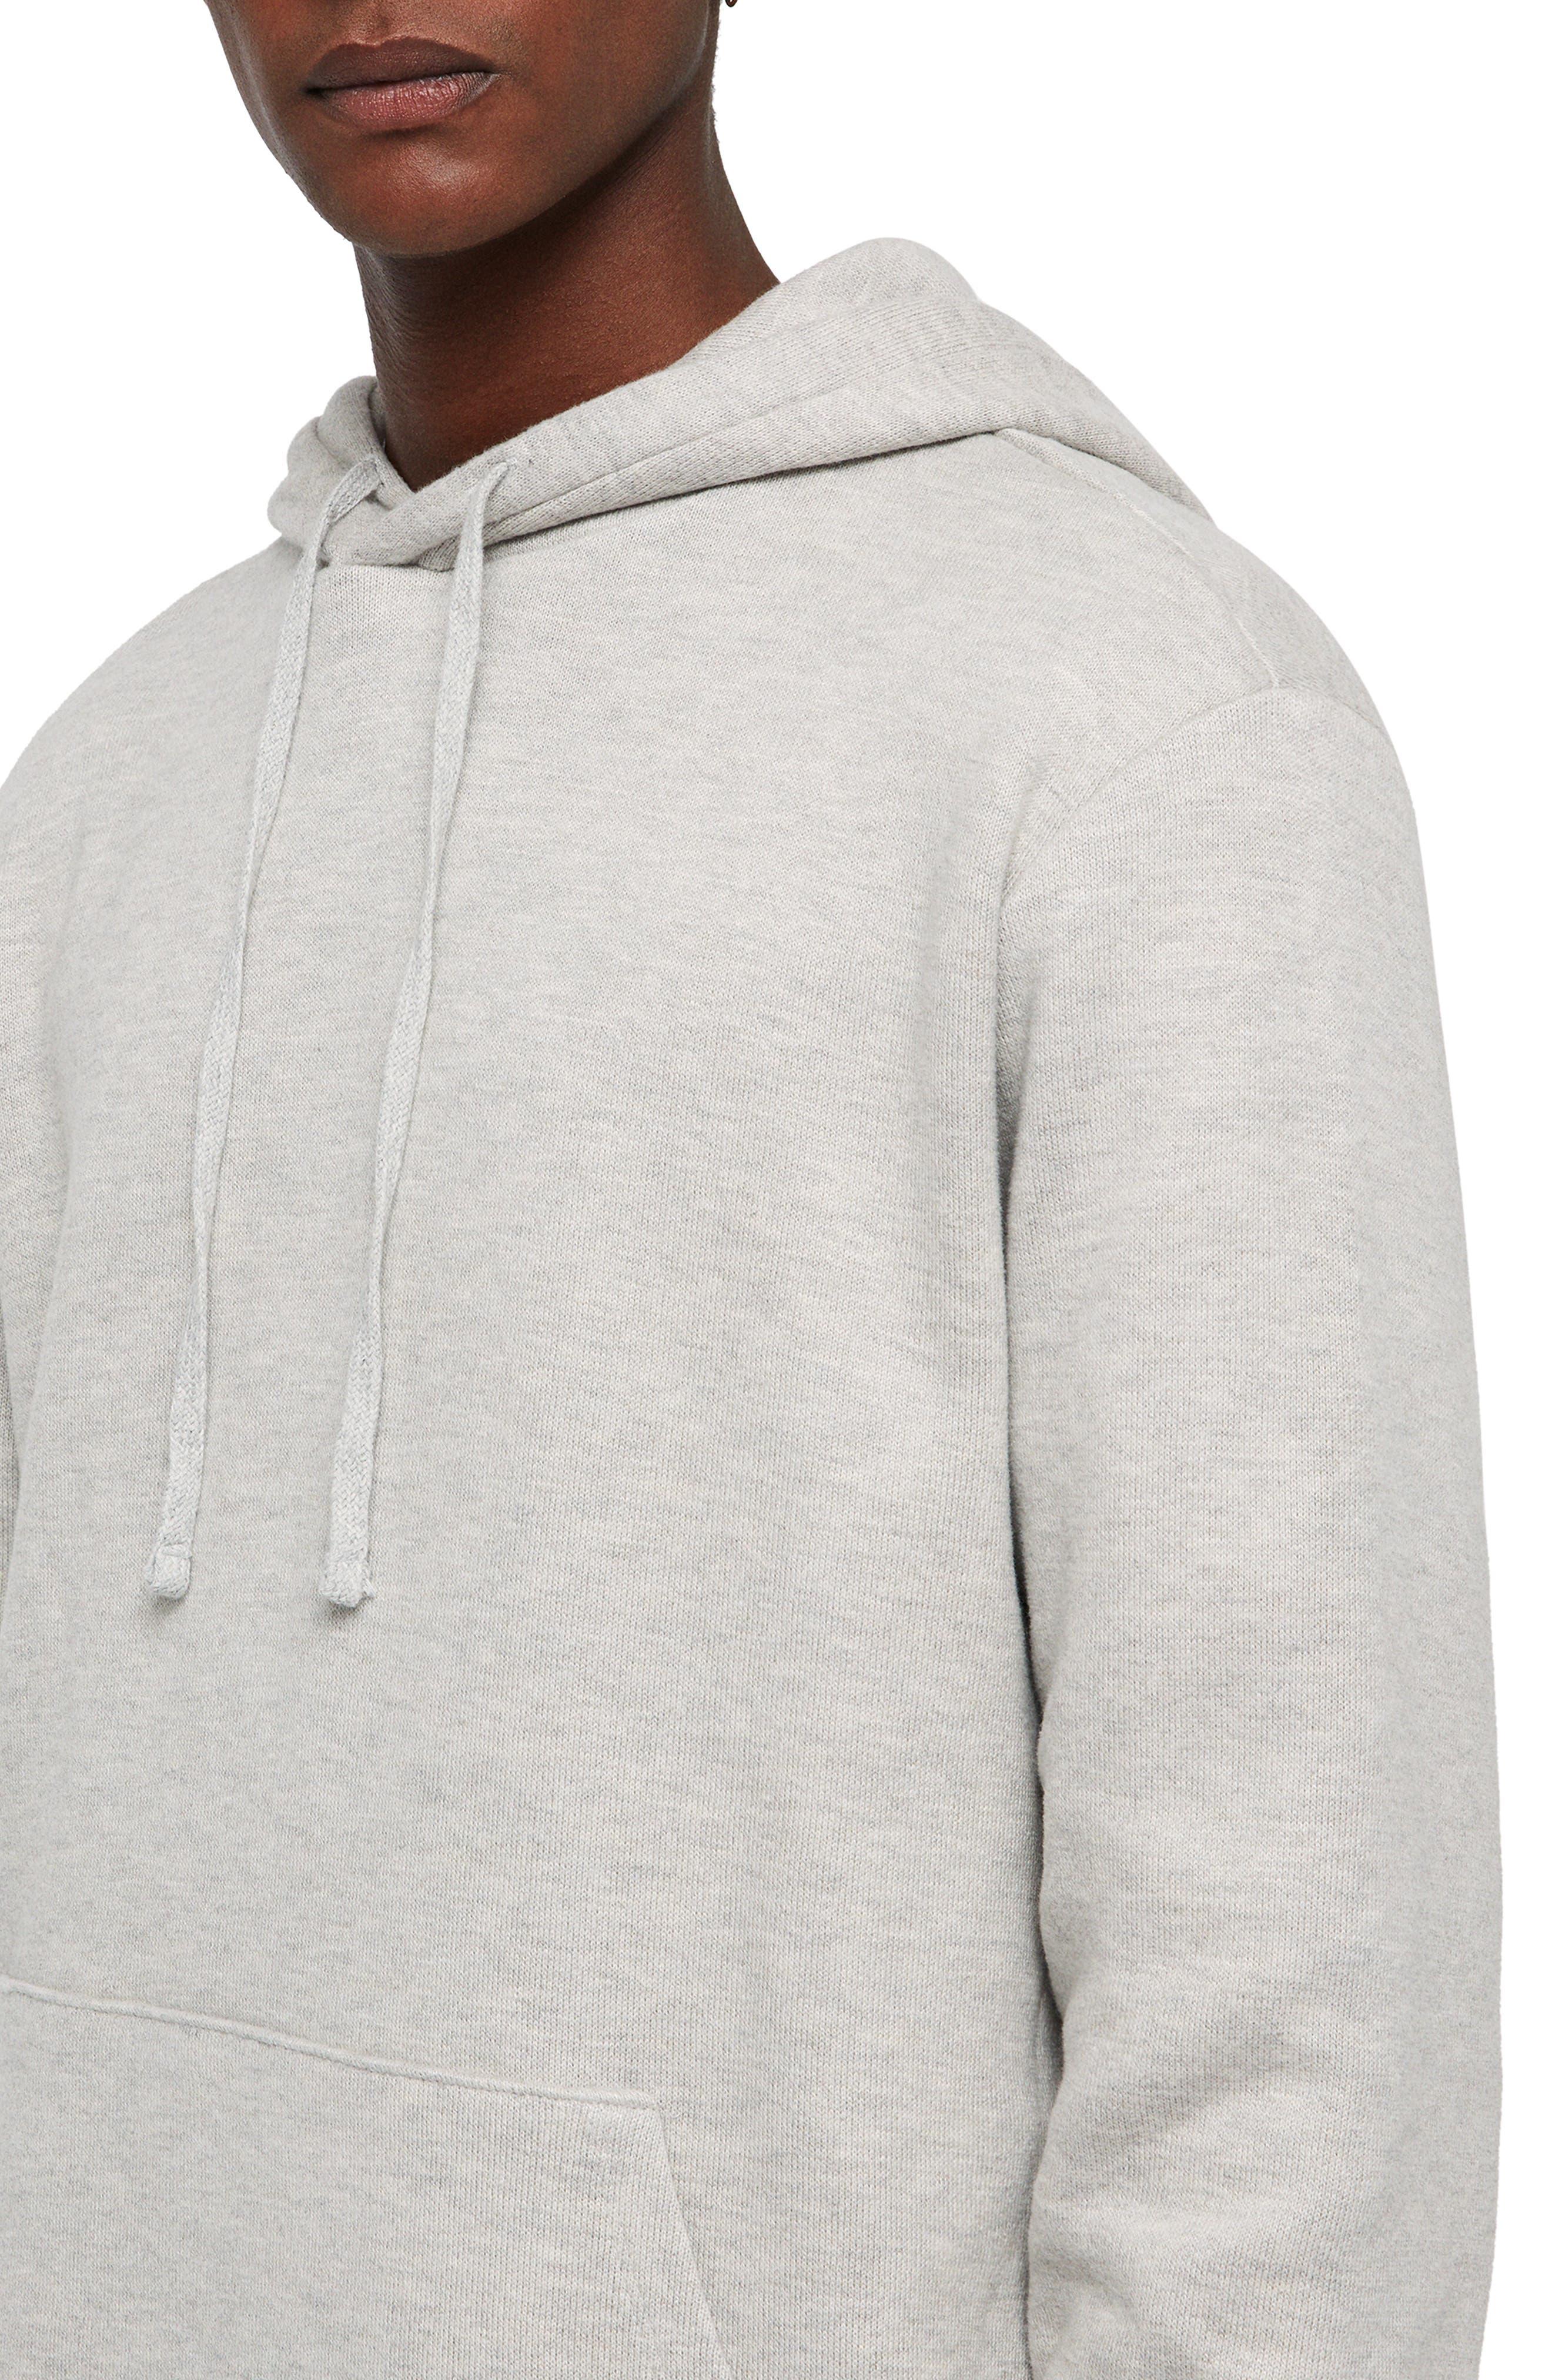 Cordum Slim Fit Pullover Hoodie,                             Alternate thumbnail 3, color,                             063